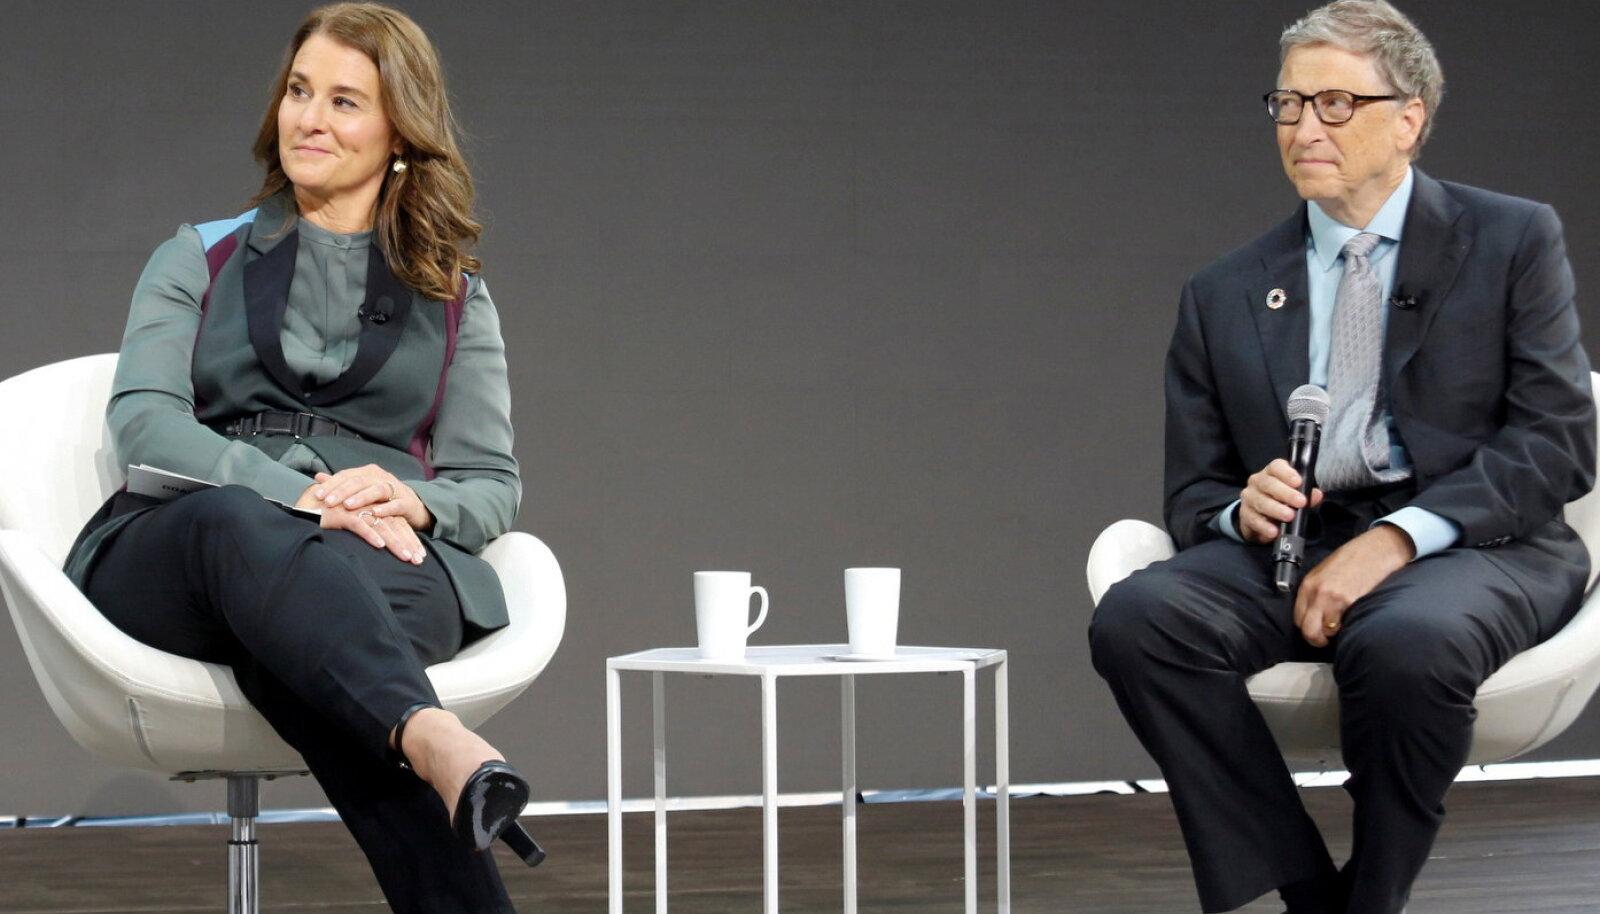 Melinda ja Bill Gates, 2017